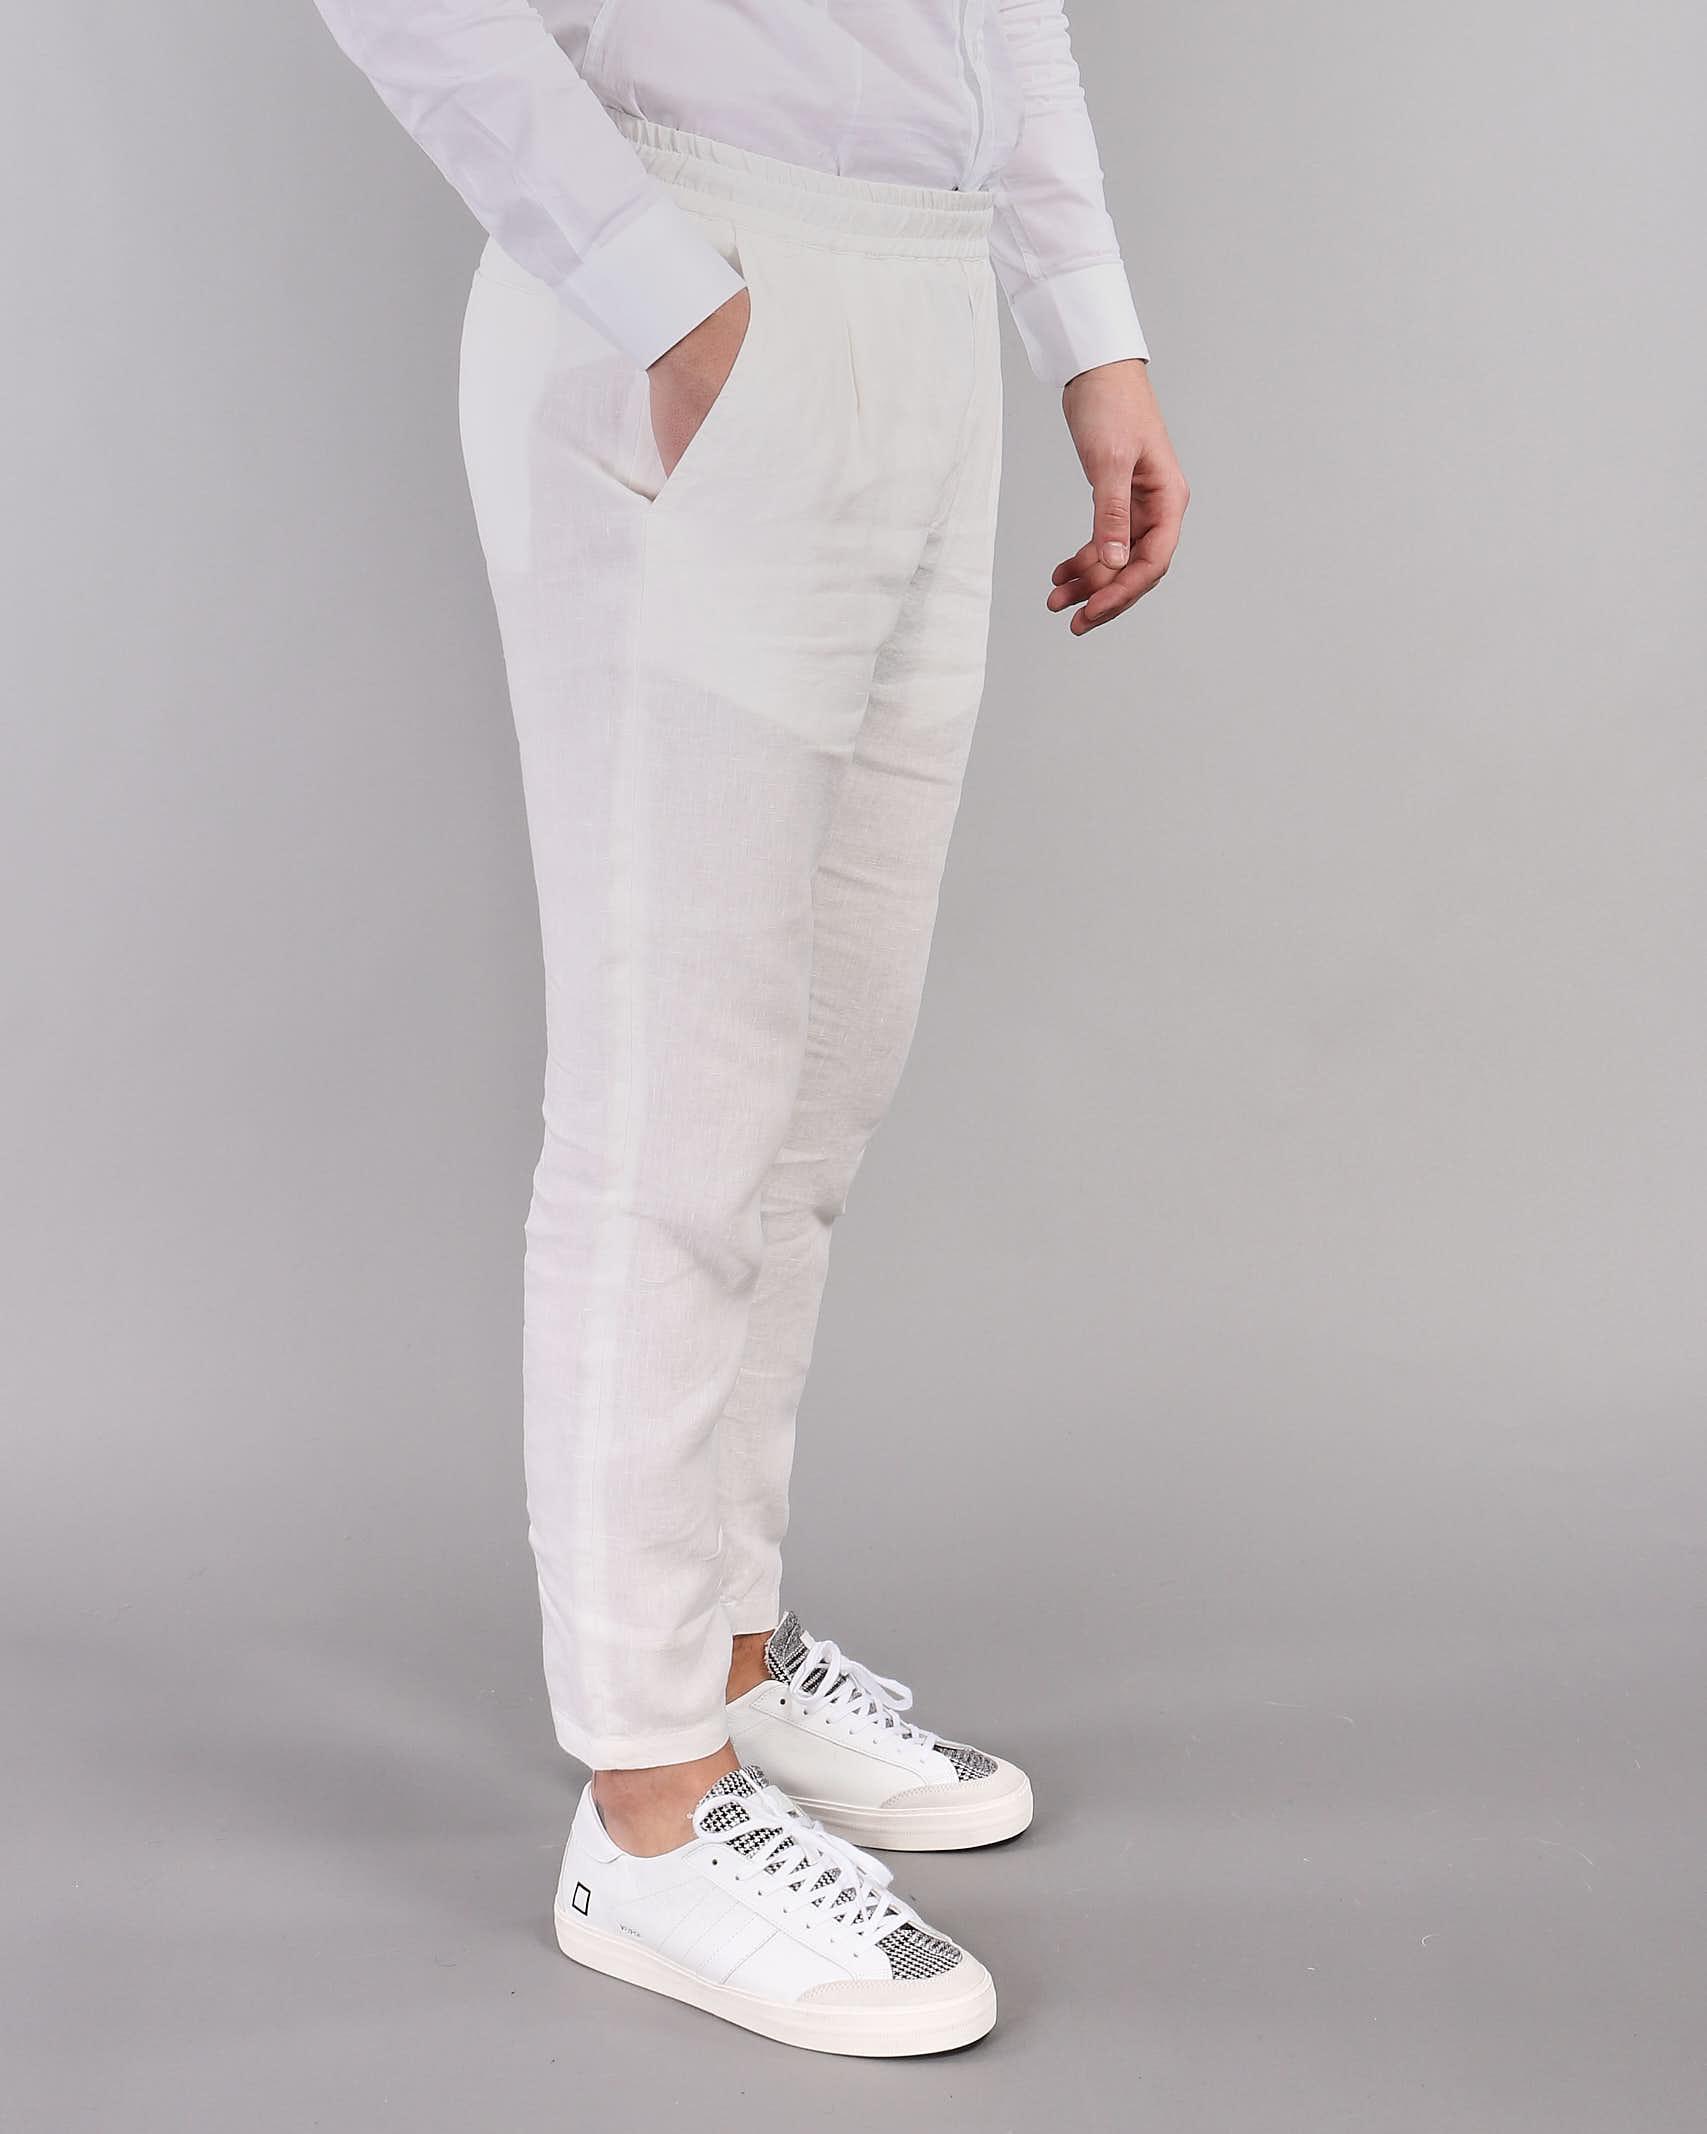 Pantalone in lino con elastico Low Brand LOW BRAND | Pantalone | L1PSS215716A001